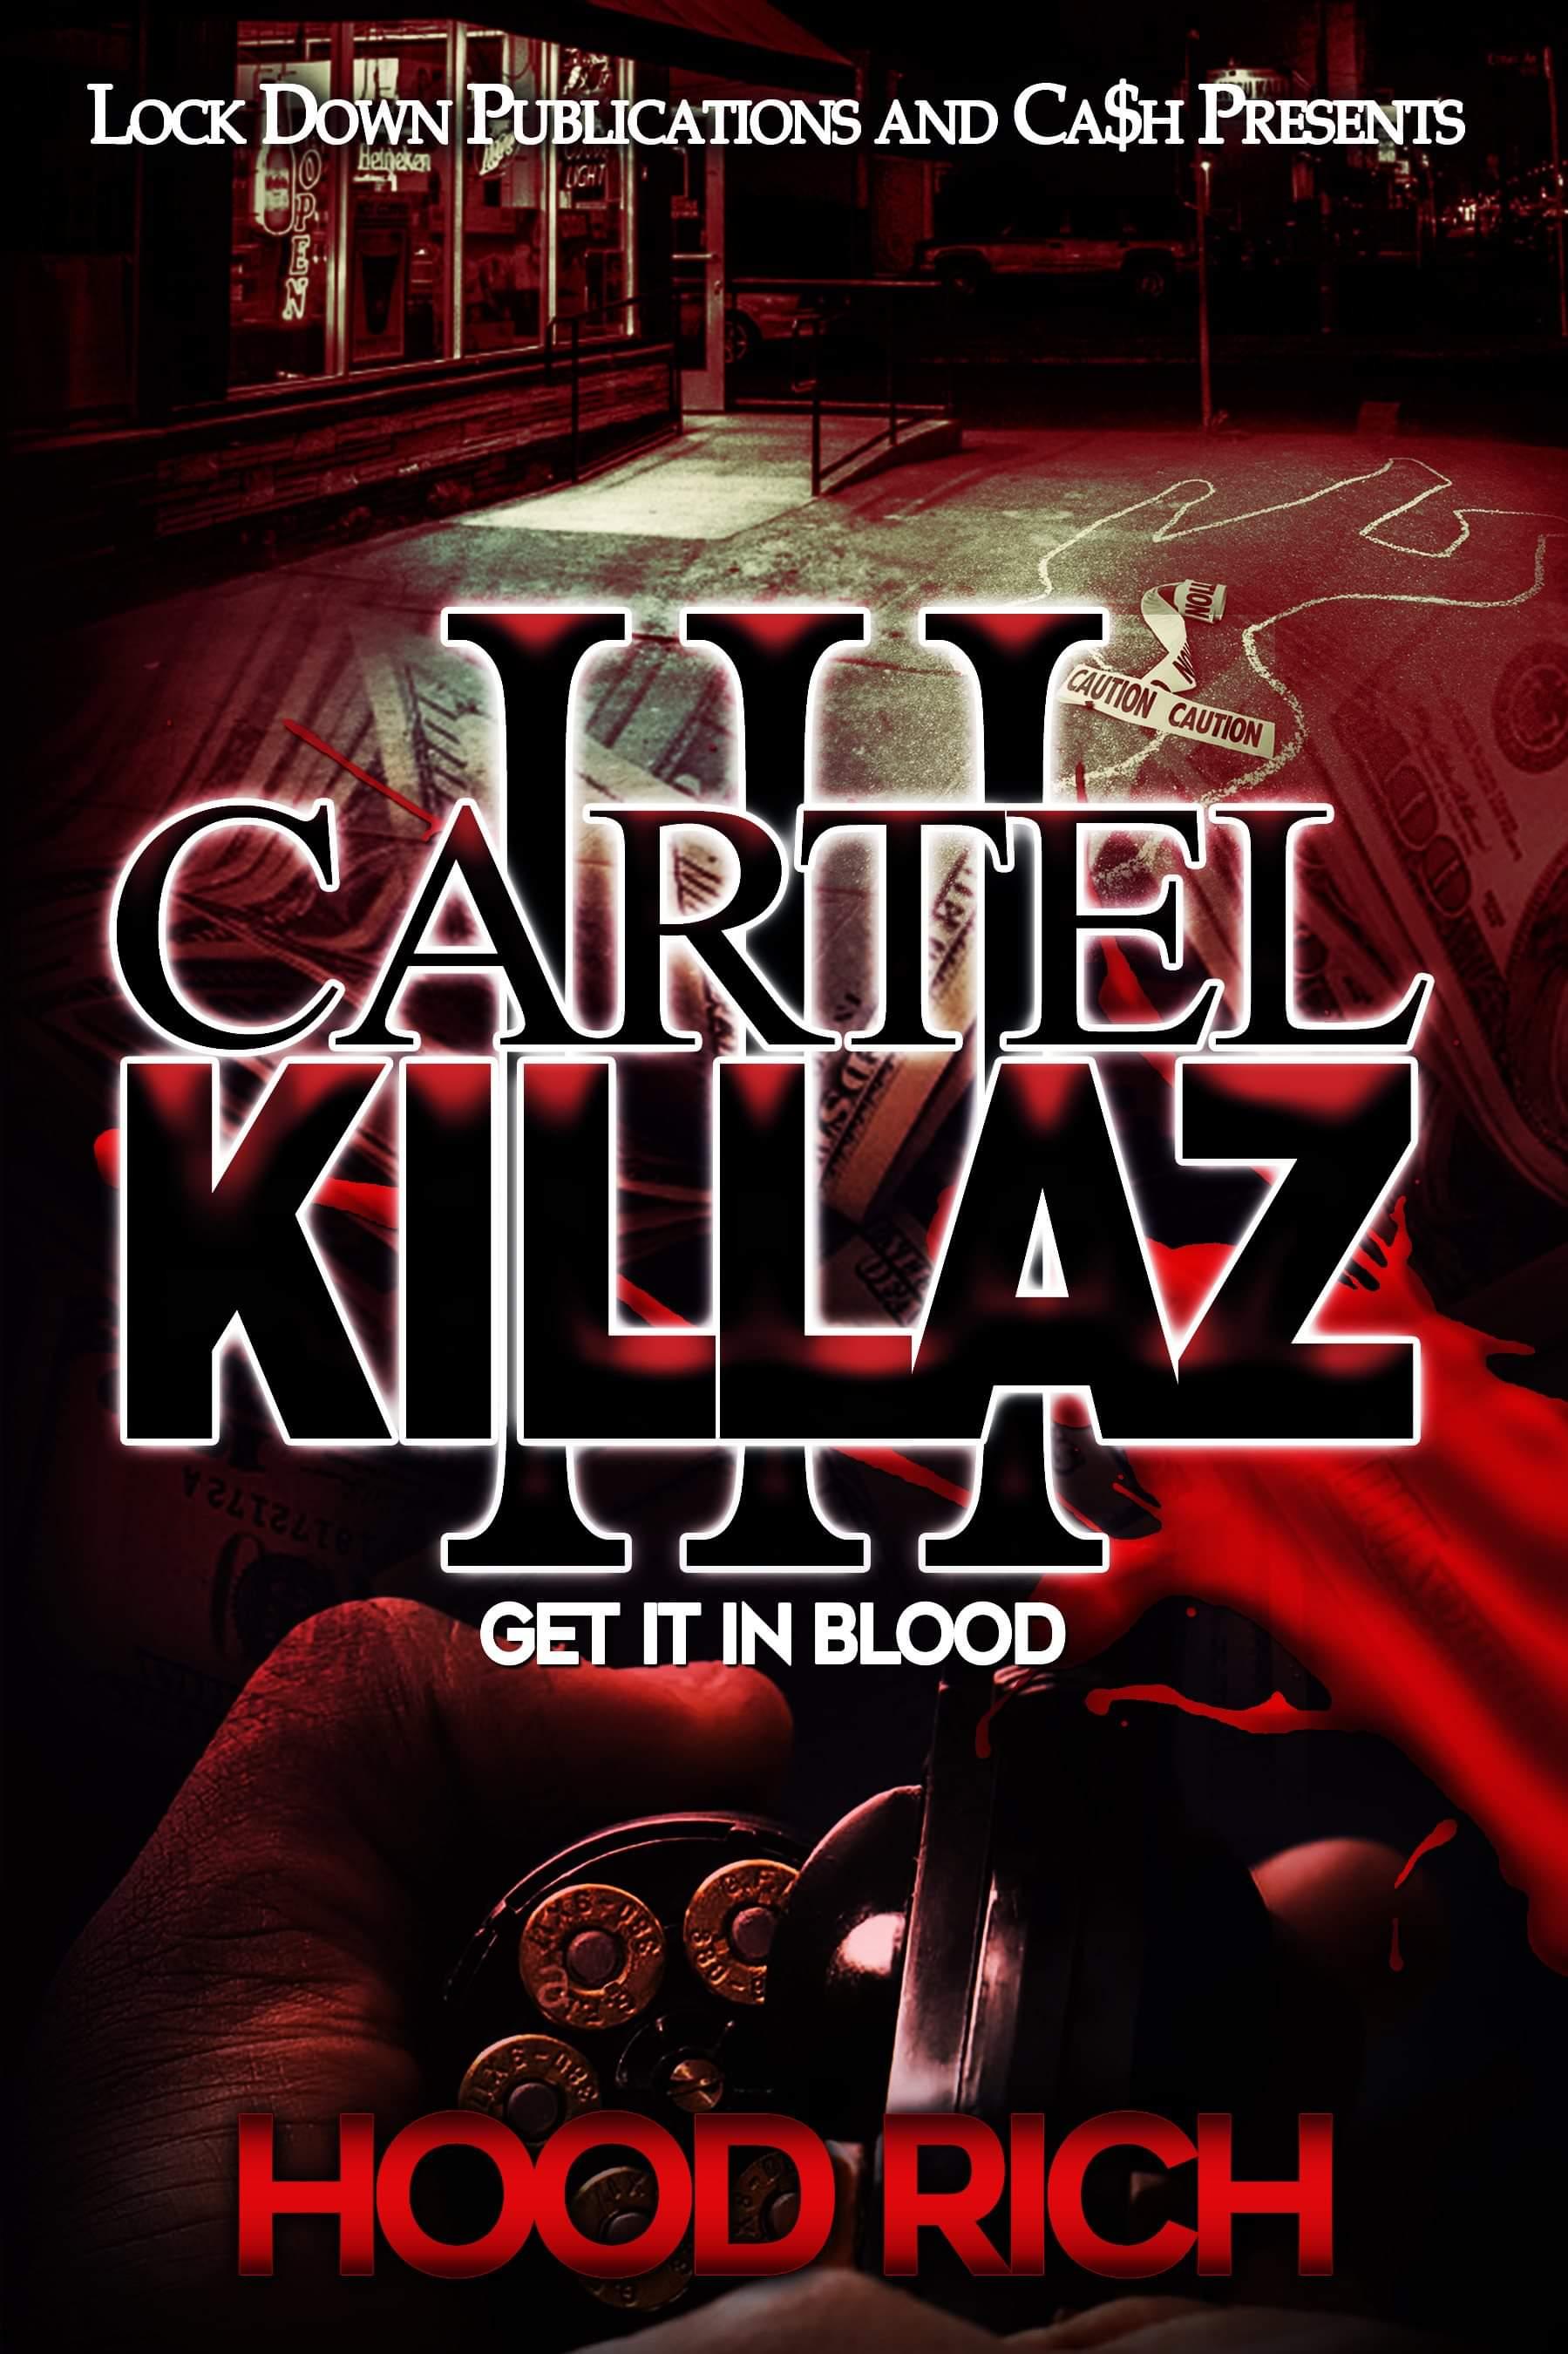 Cartel Killaz Part 3 by Hood Rich